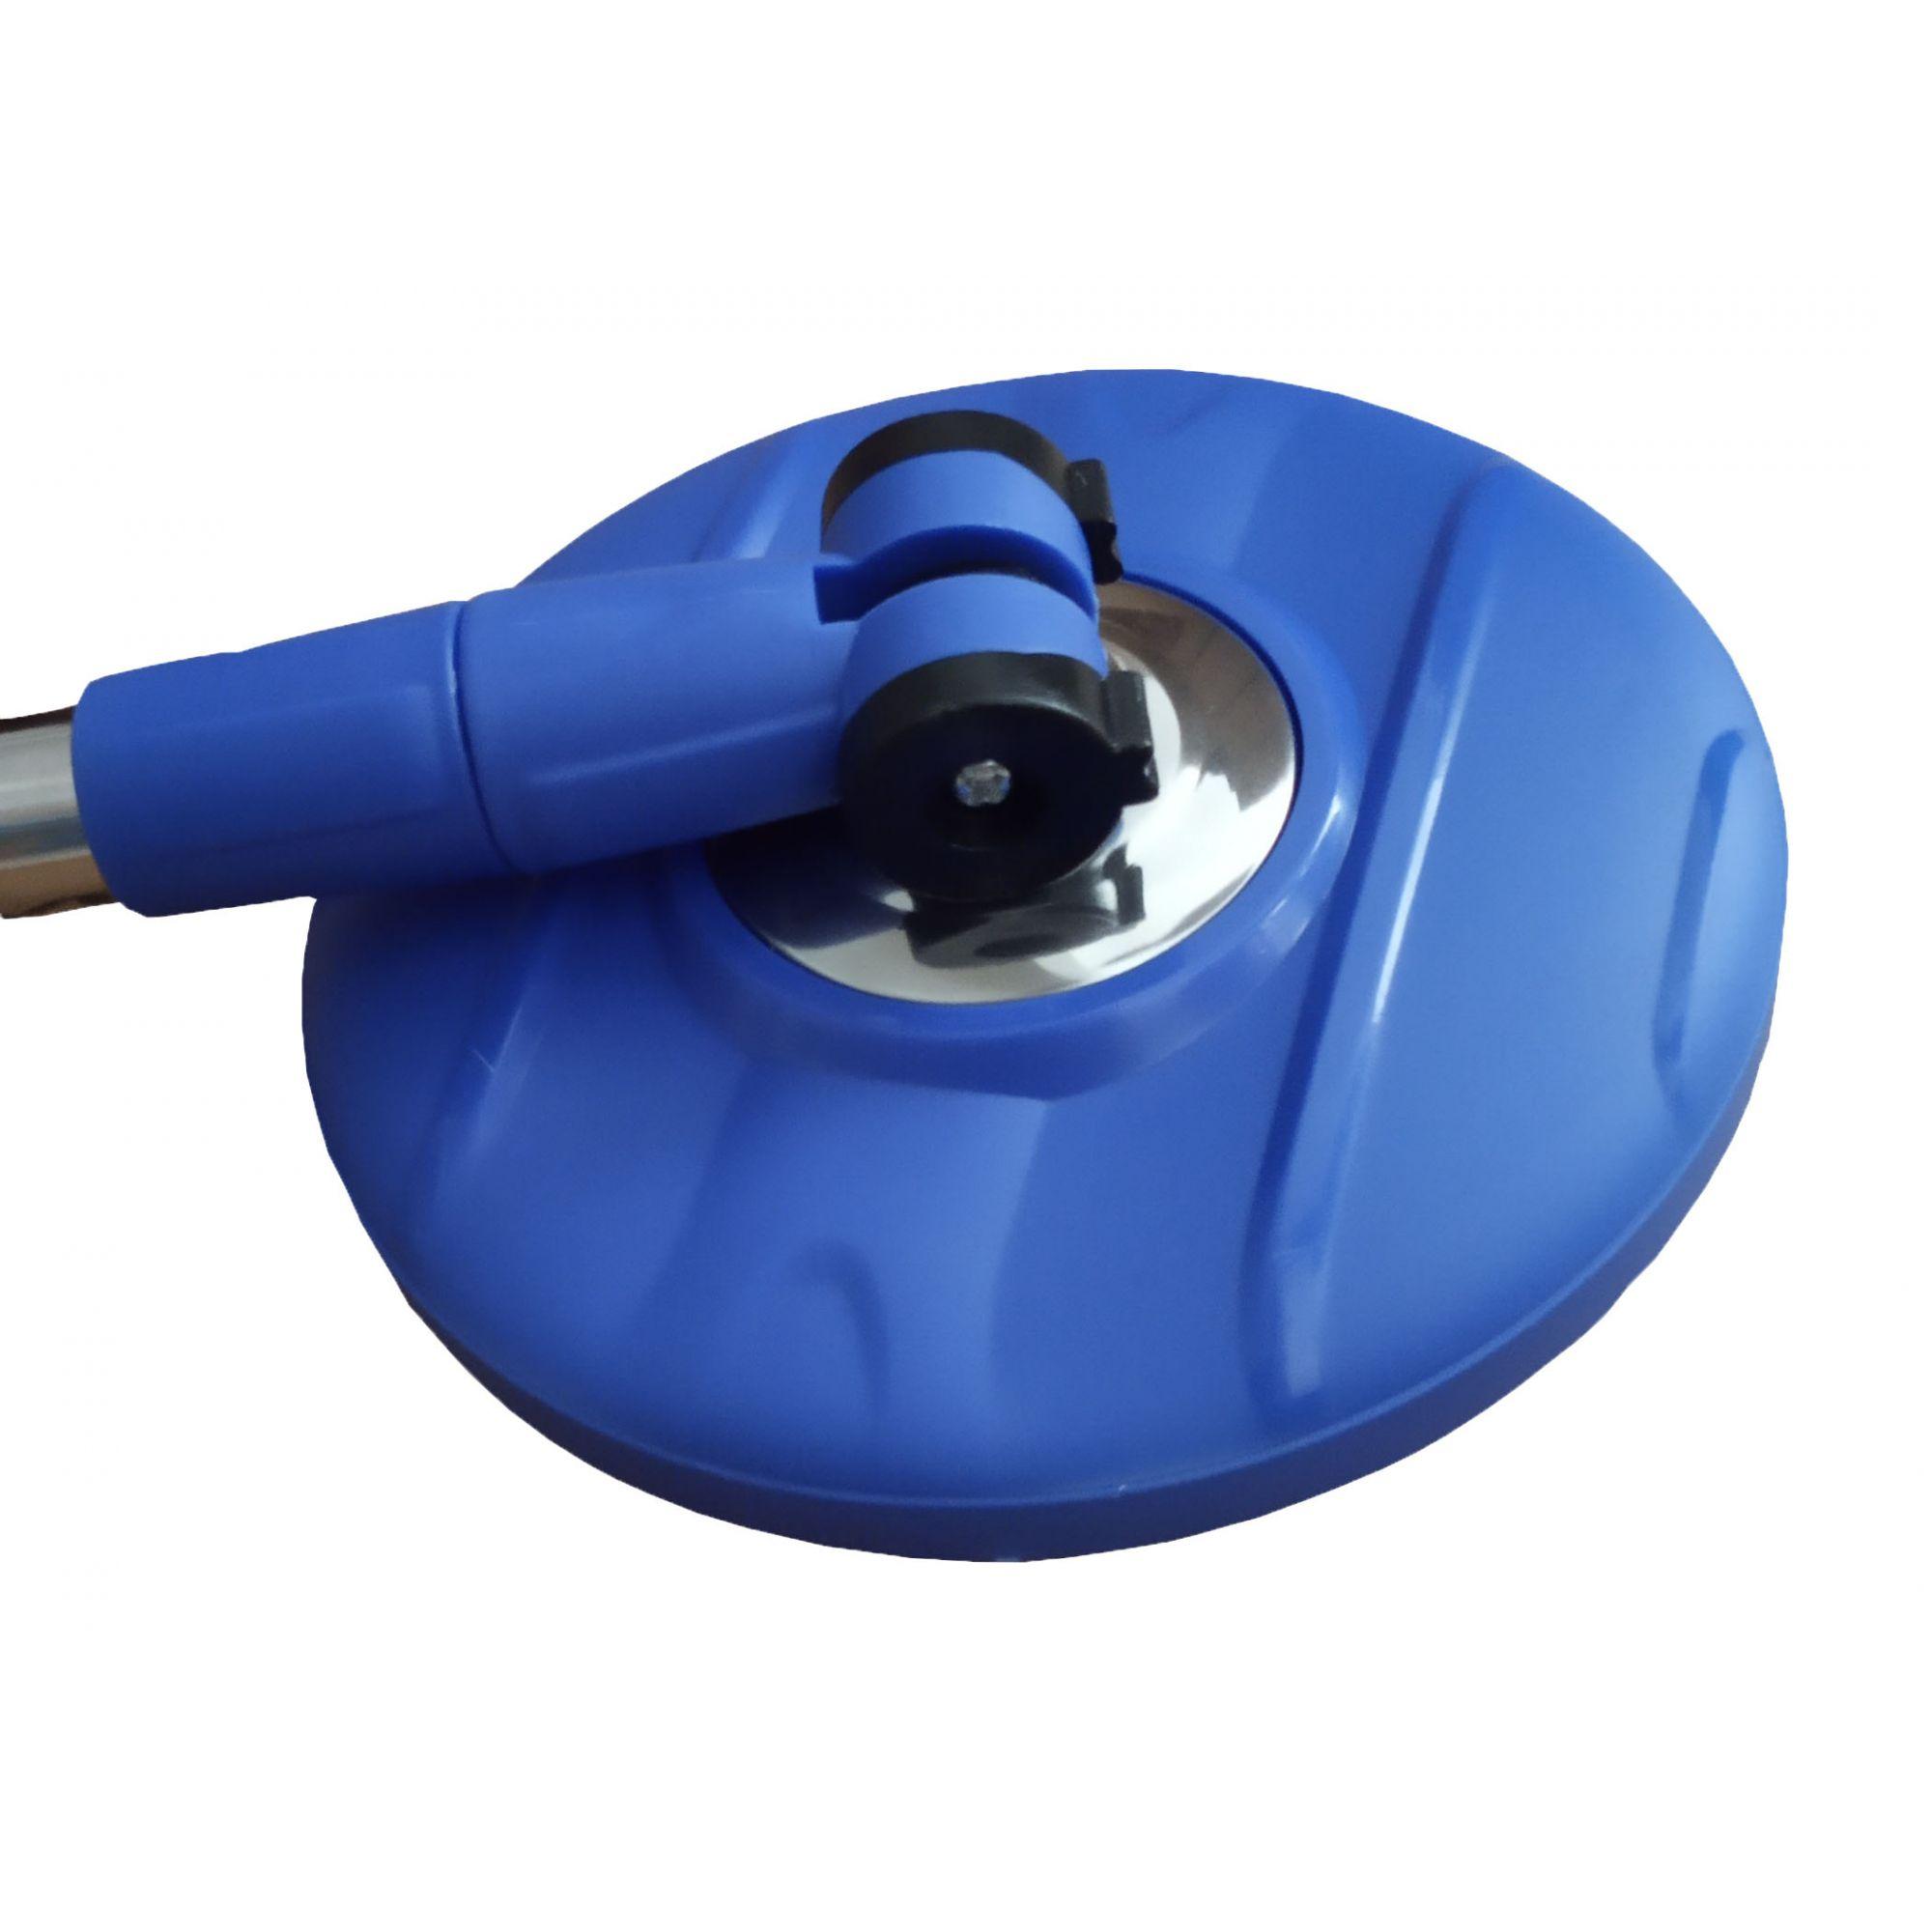 Perfect Mop 360 Cesto Inox Com 3 Refil Cabo 1,60 Mts e Limpador Magnético